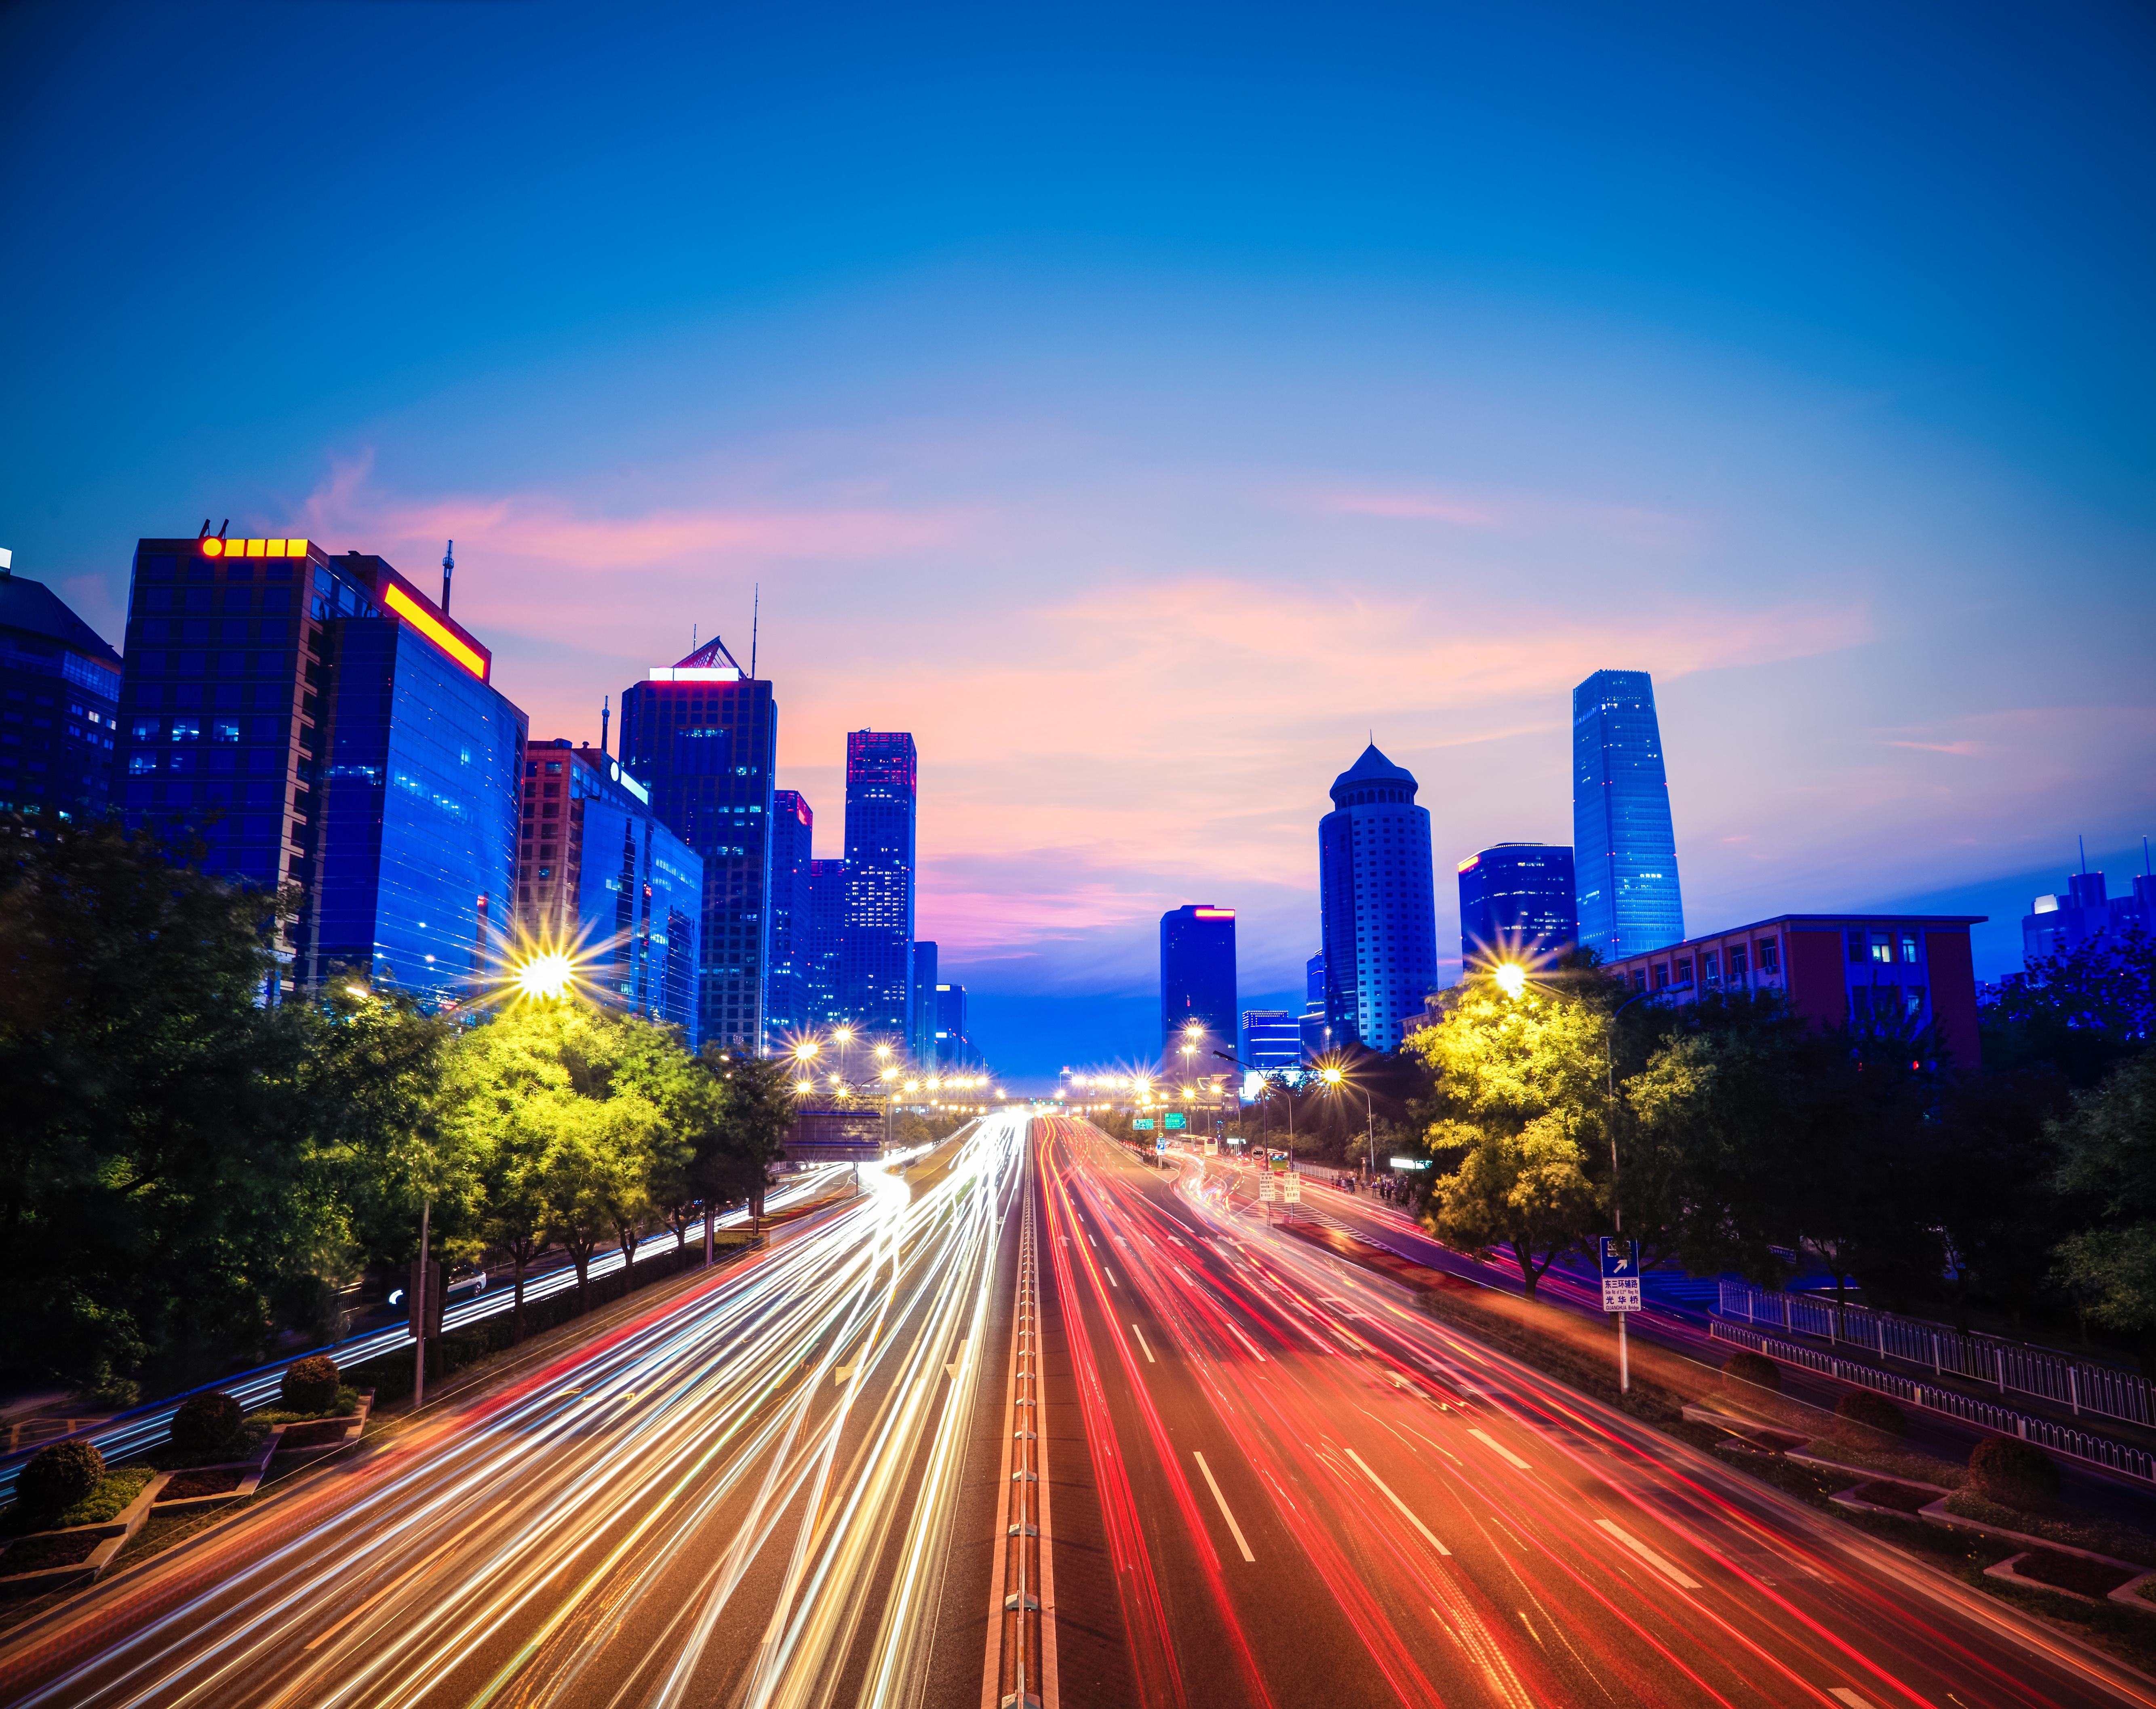 beijing-central-business-district-in-nightfall-PLVAPYN.jpg